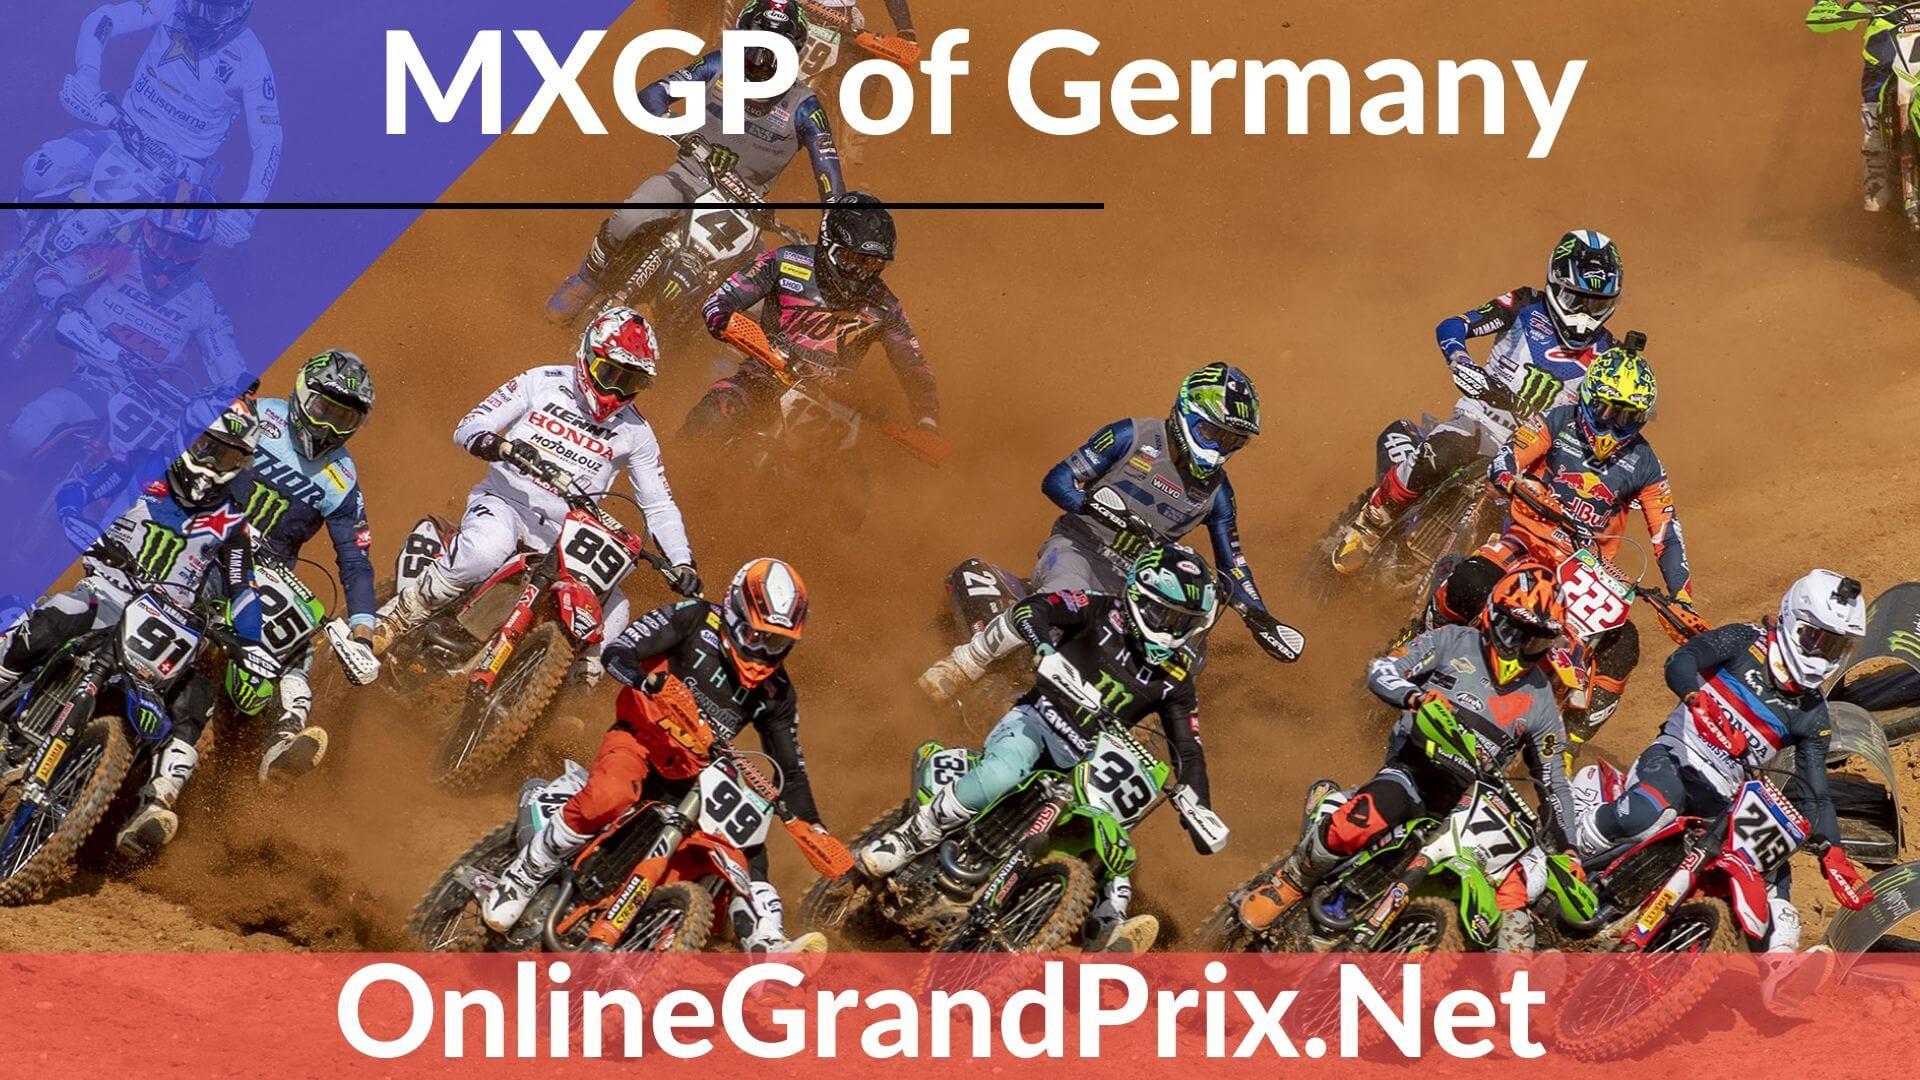 Watch Motocross Germany 2016 Live Telecast